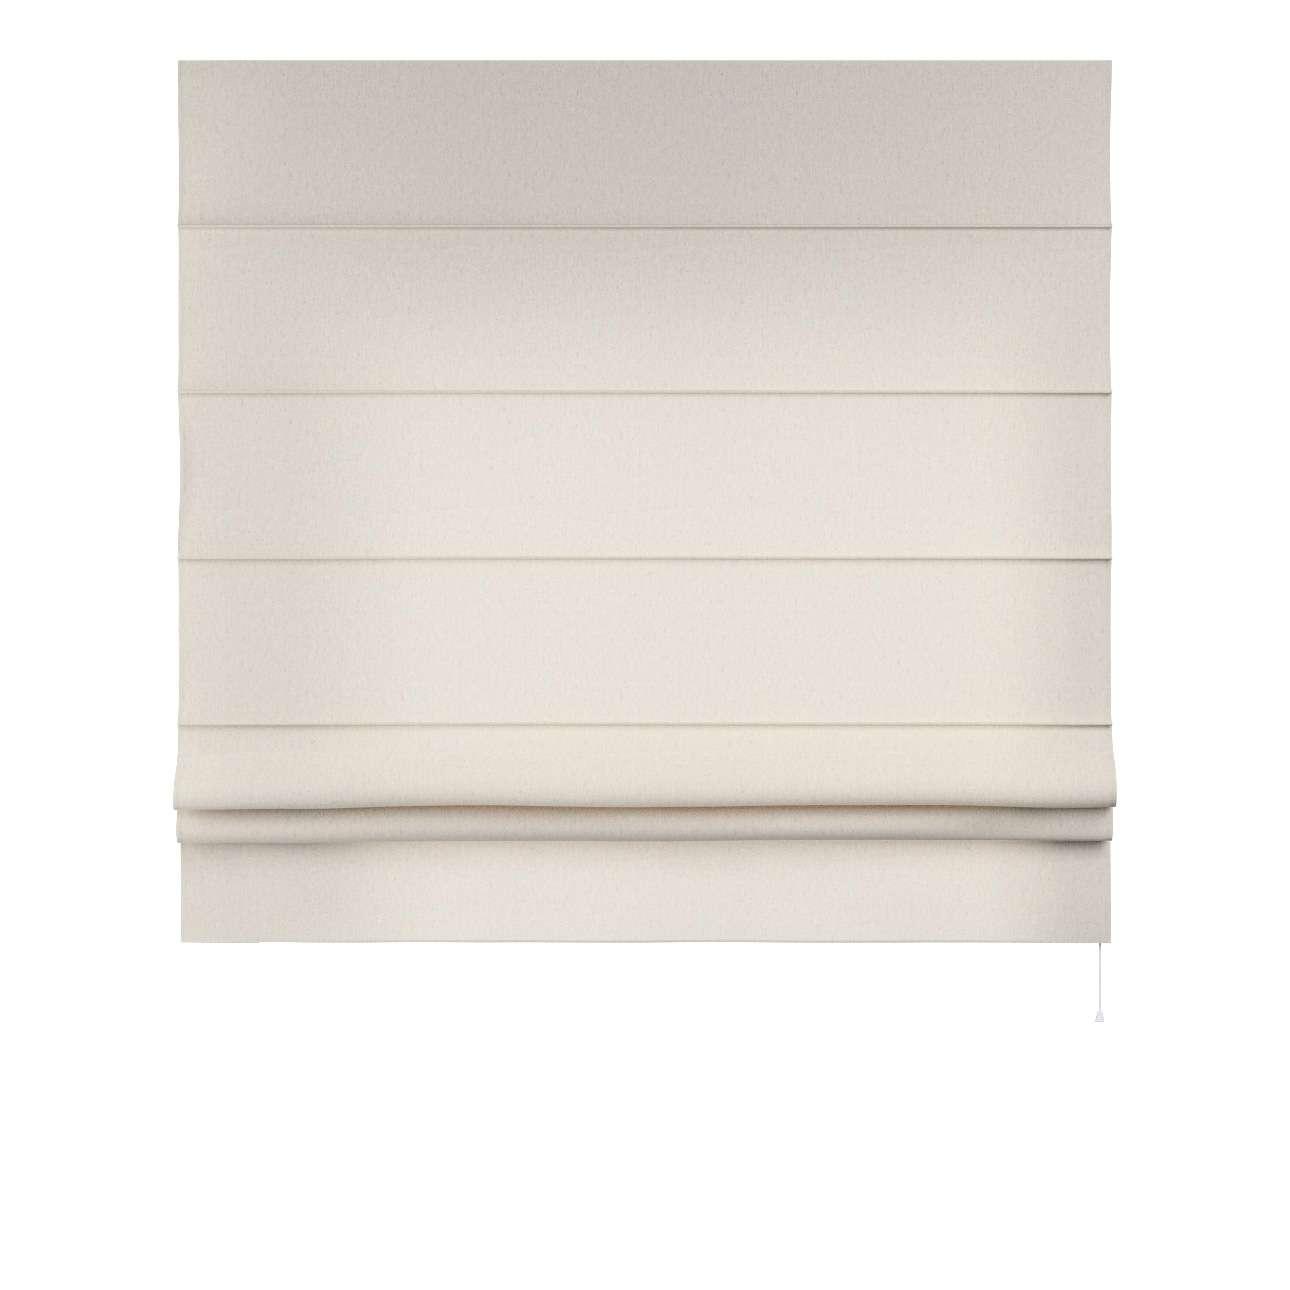 vouwgordijn Padva 80 x 170 cm van de collectie Loneta, Stof: 133-65